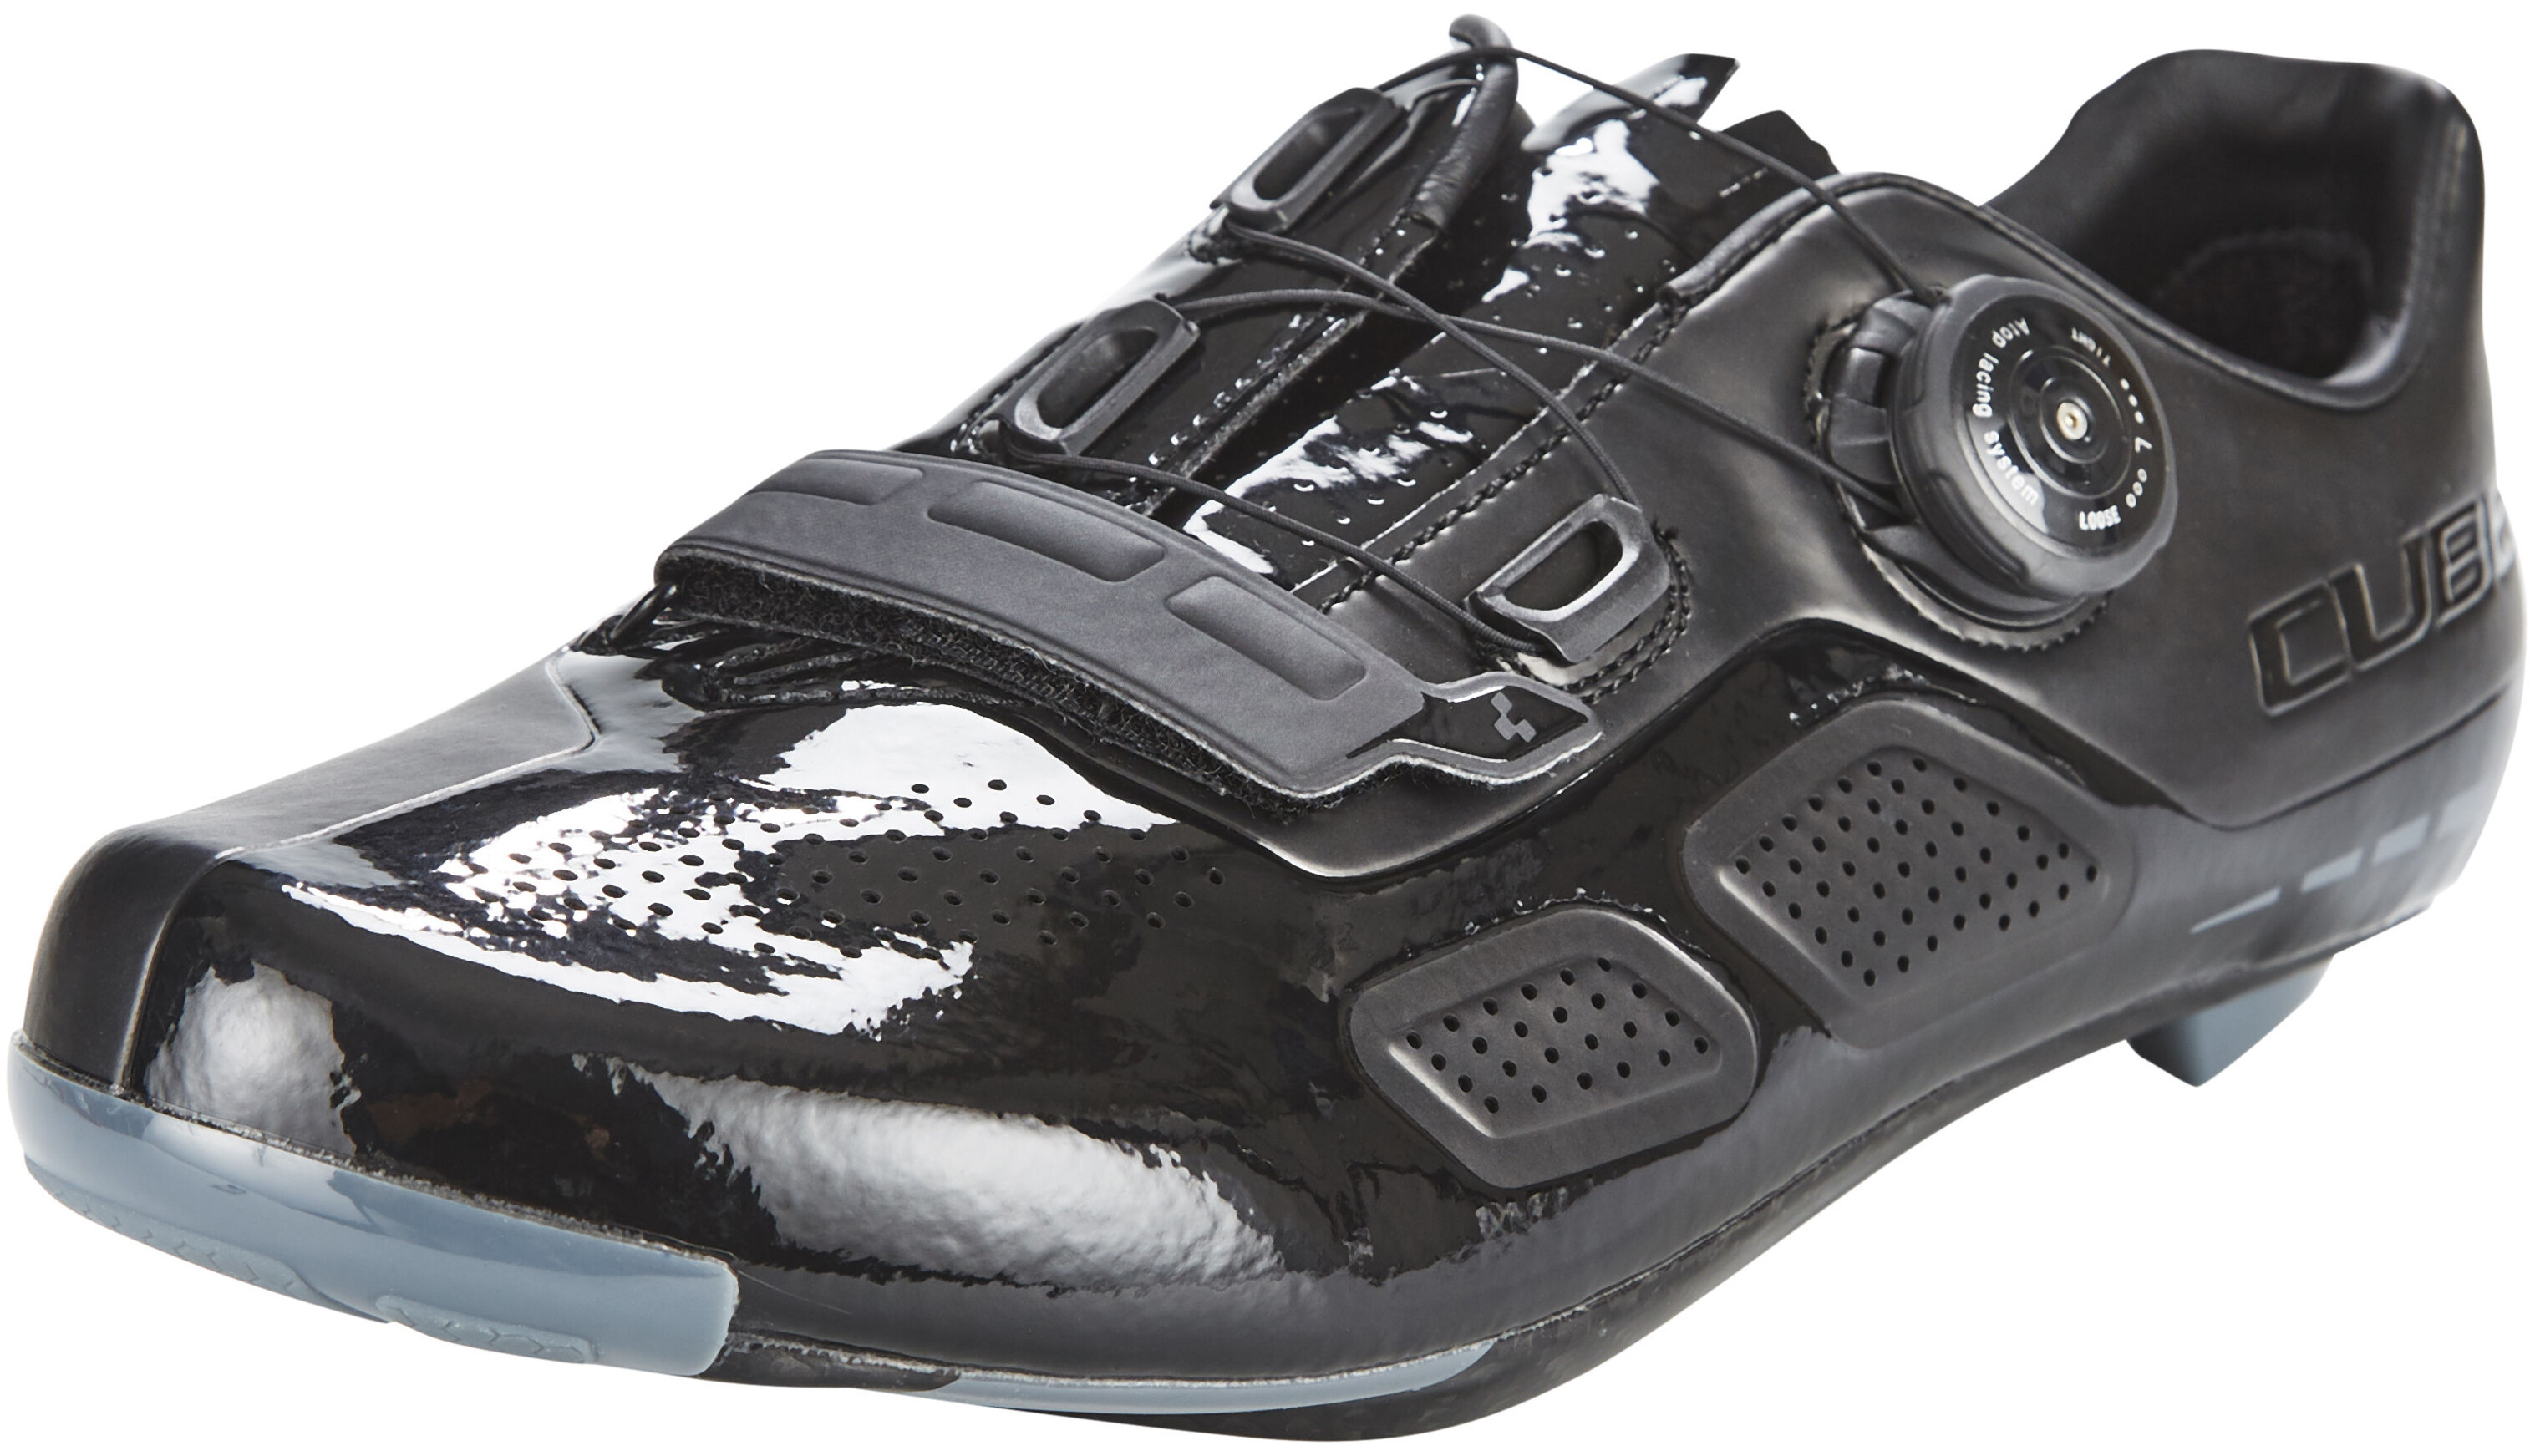 07345b506d8 Cube Road C:62 schoenen, blackline